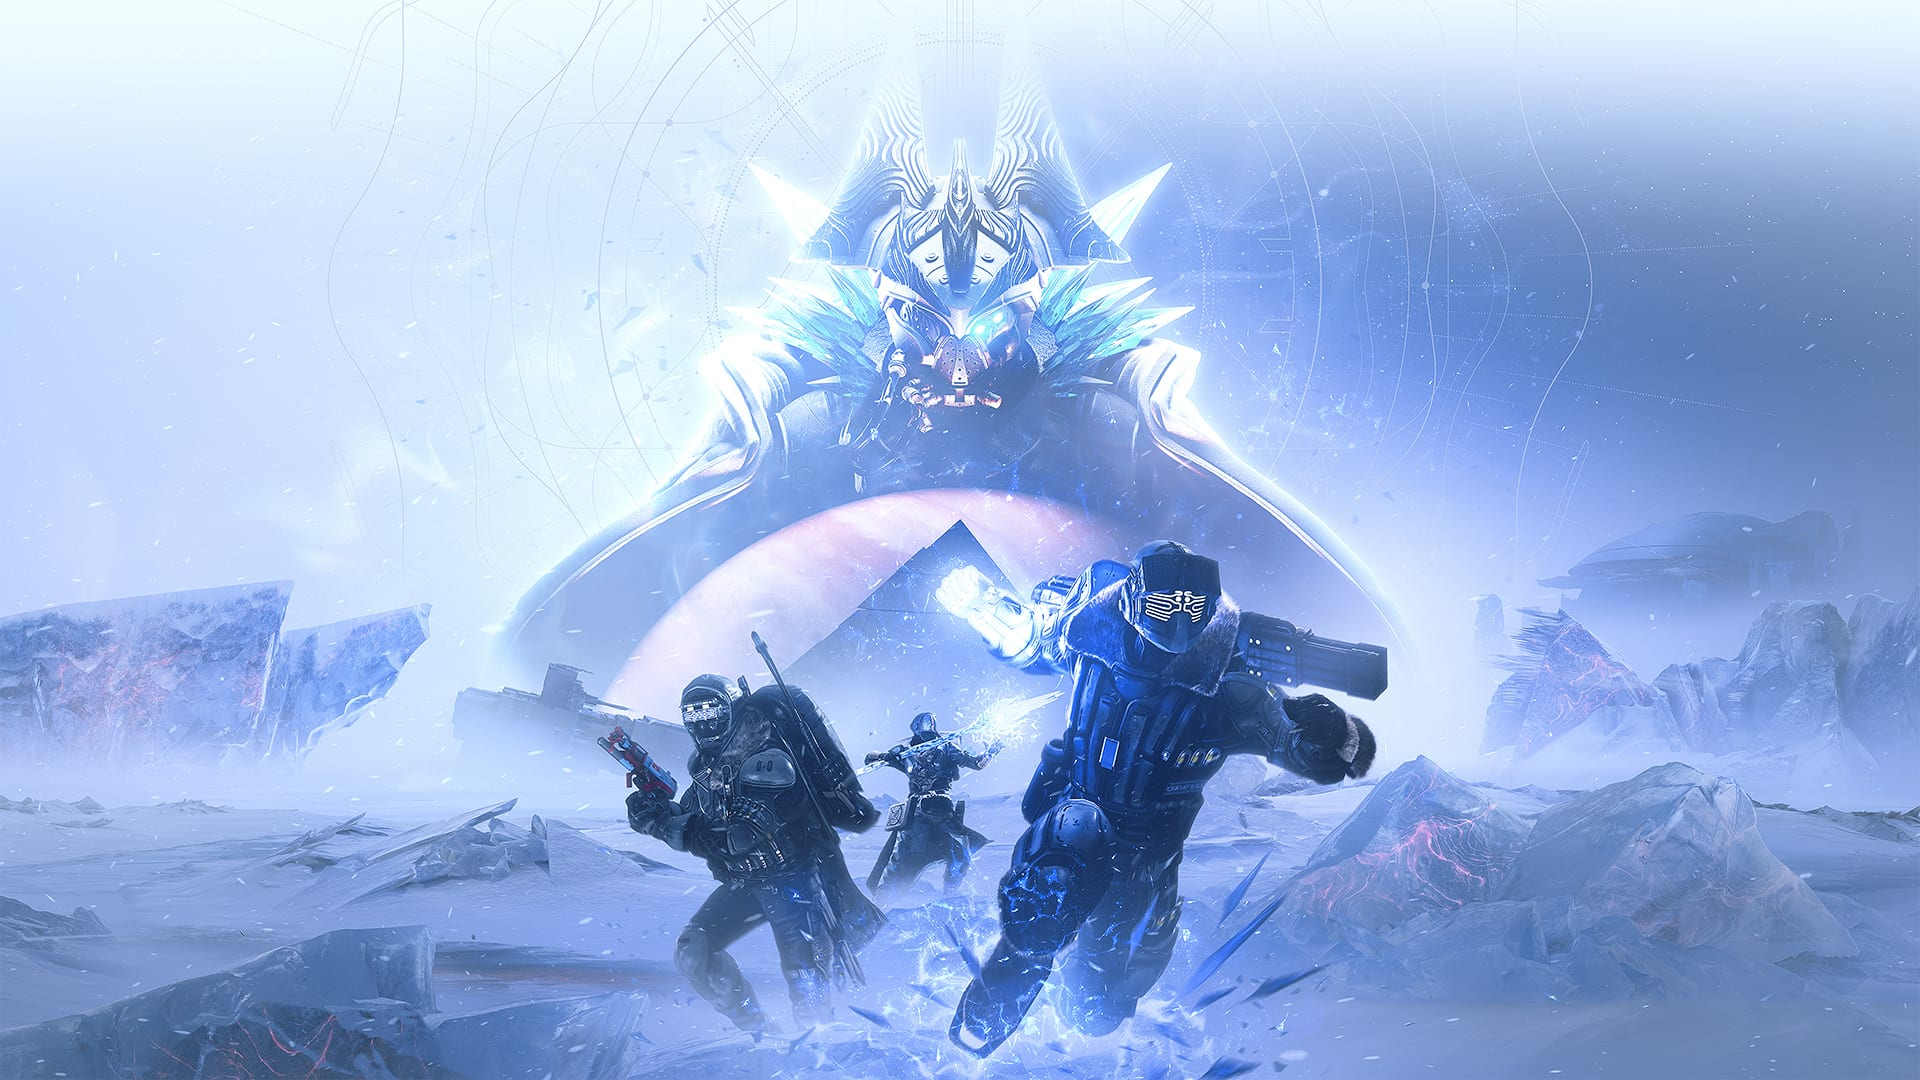 destiny 2 born in darkness part 2 quest guide